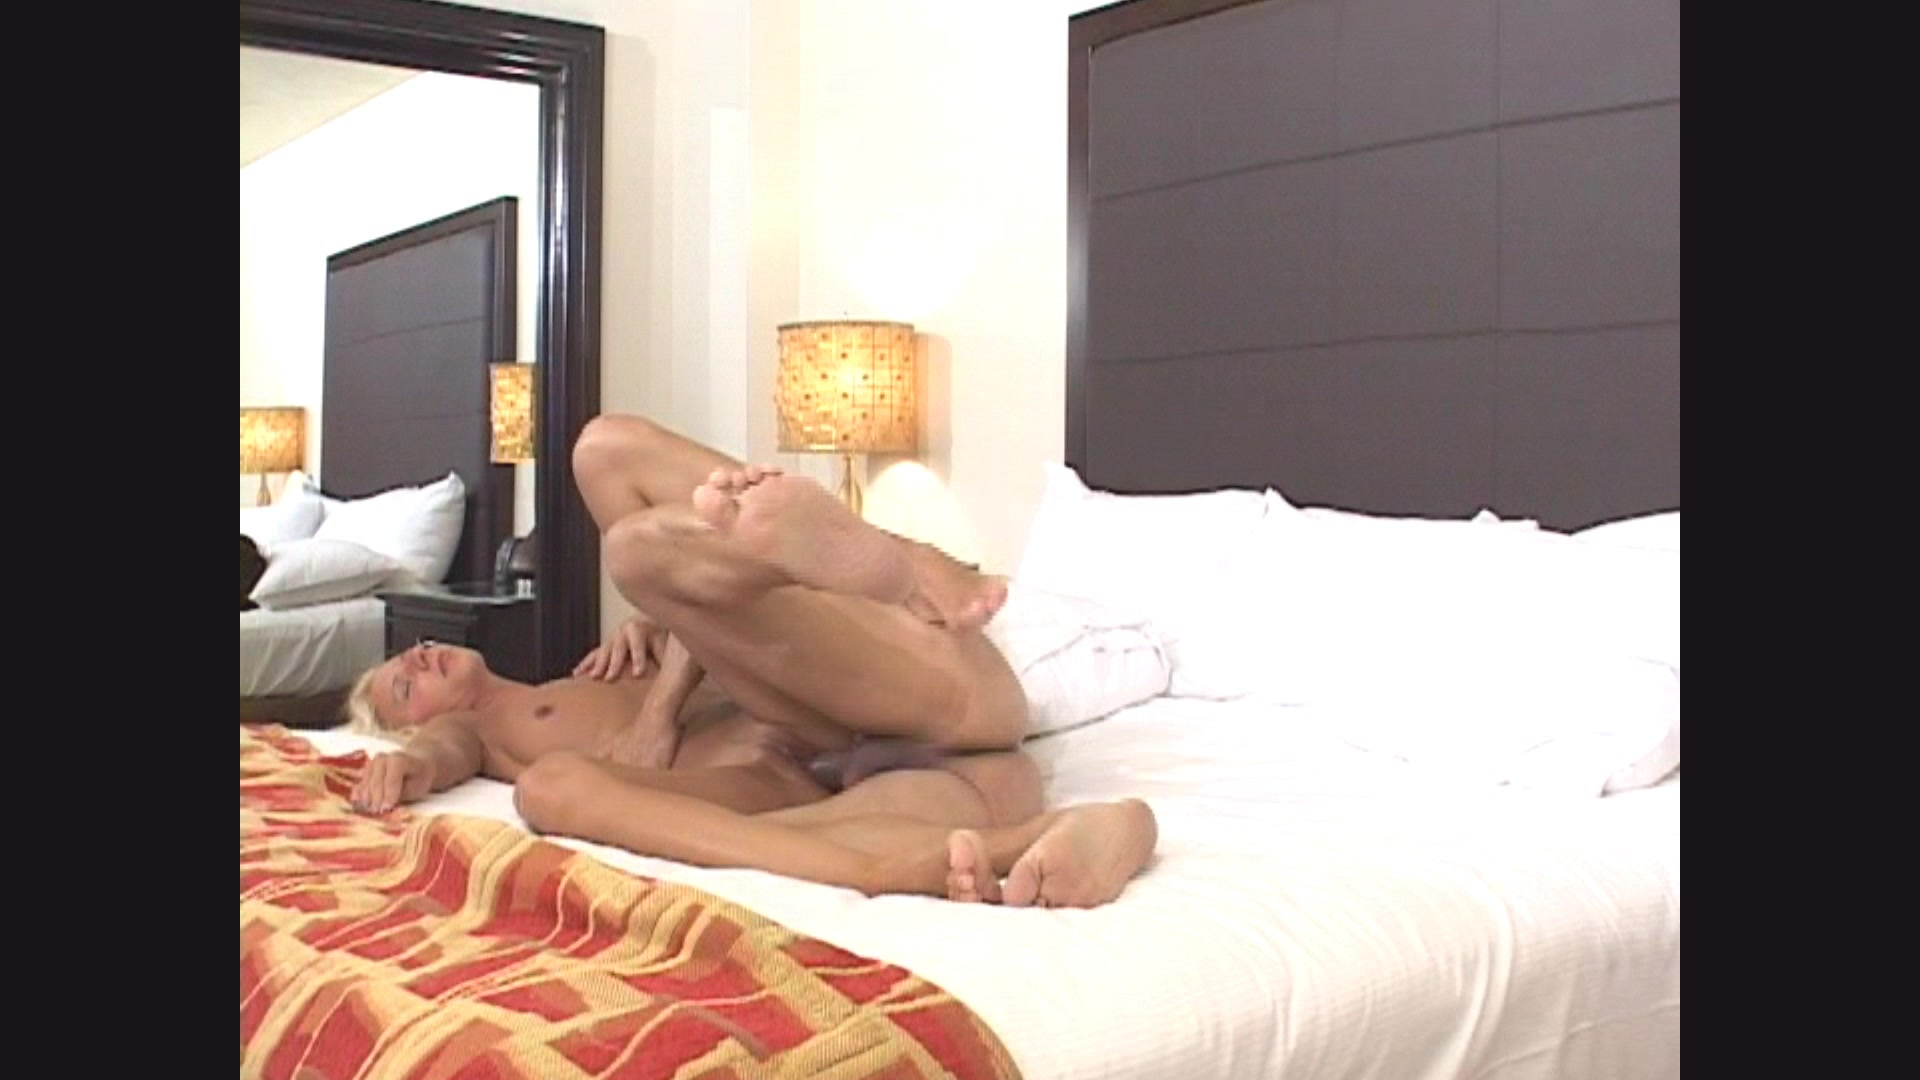 mutual masturbation online